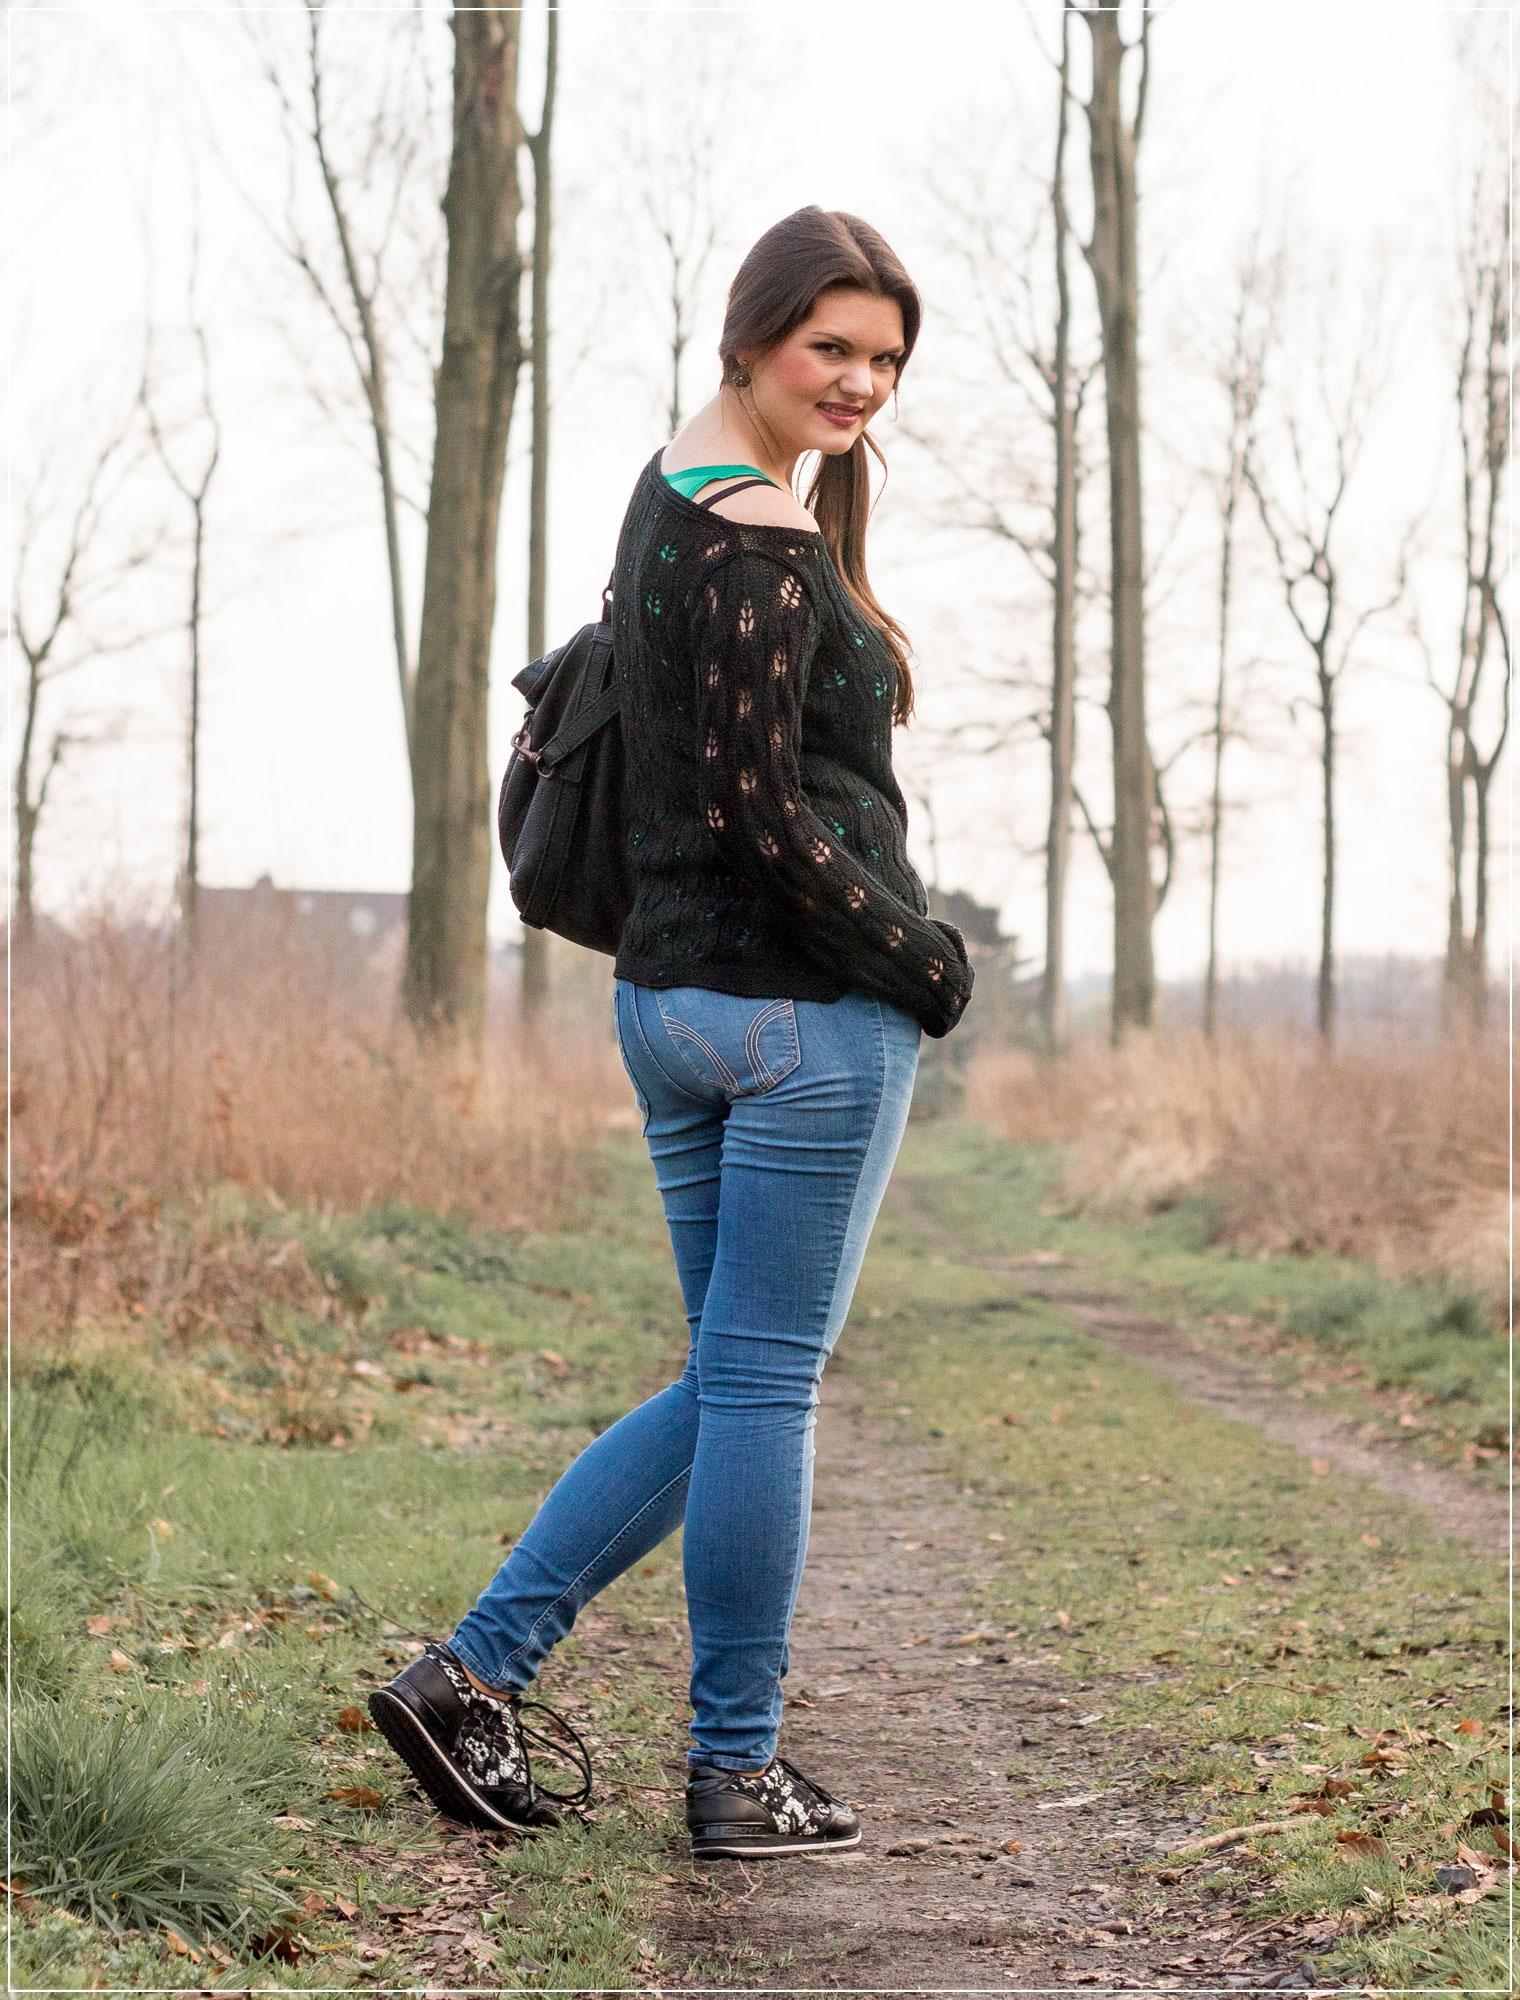 Modetrend, Strick im Frühling kombinieren, sportlicher Fruehlingslook, Spring Style, Outfitinspiration, Modebloggerin, Fashionbloggerin, Modeblog, Ruhrgebiet